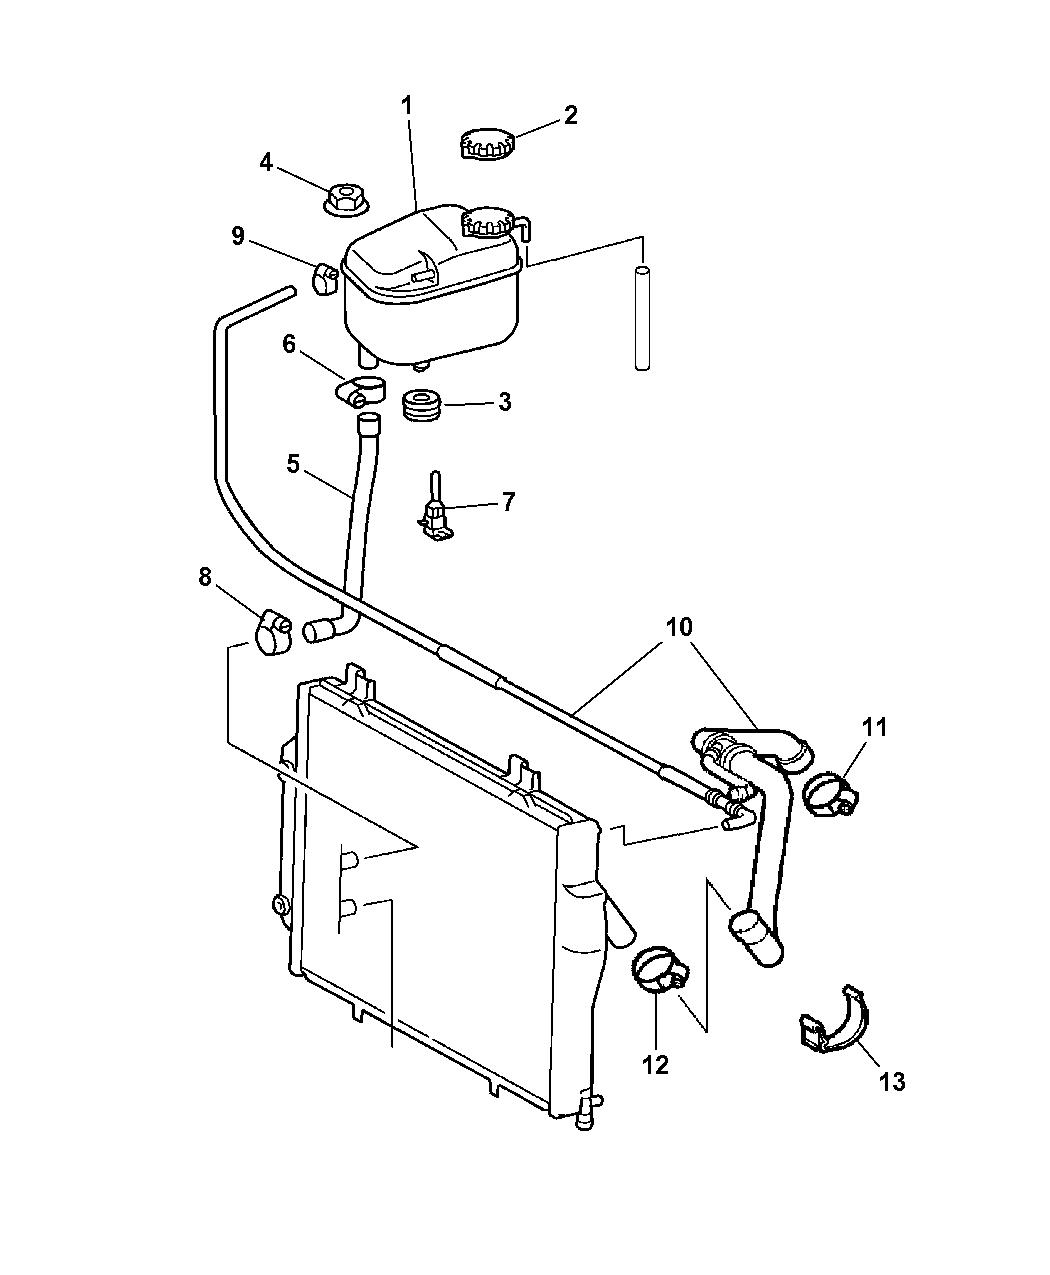 CHRYSLER OEM Crossfire-Radiator Coolant Overflow Tank Recovery Bottle 5101601AA